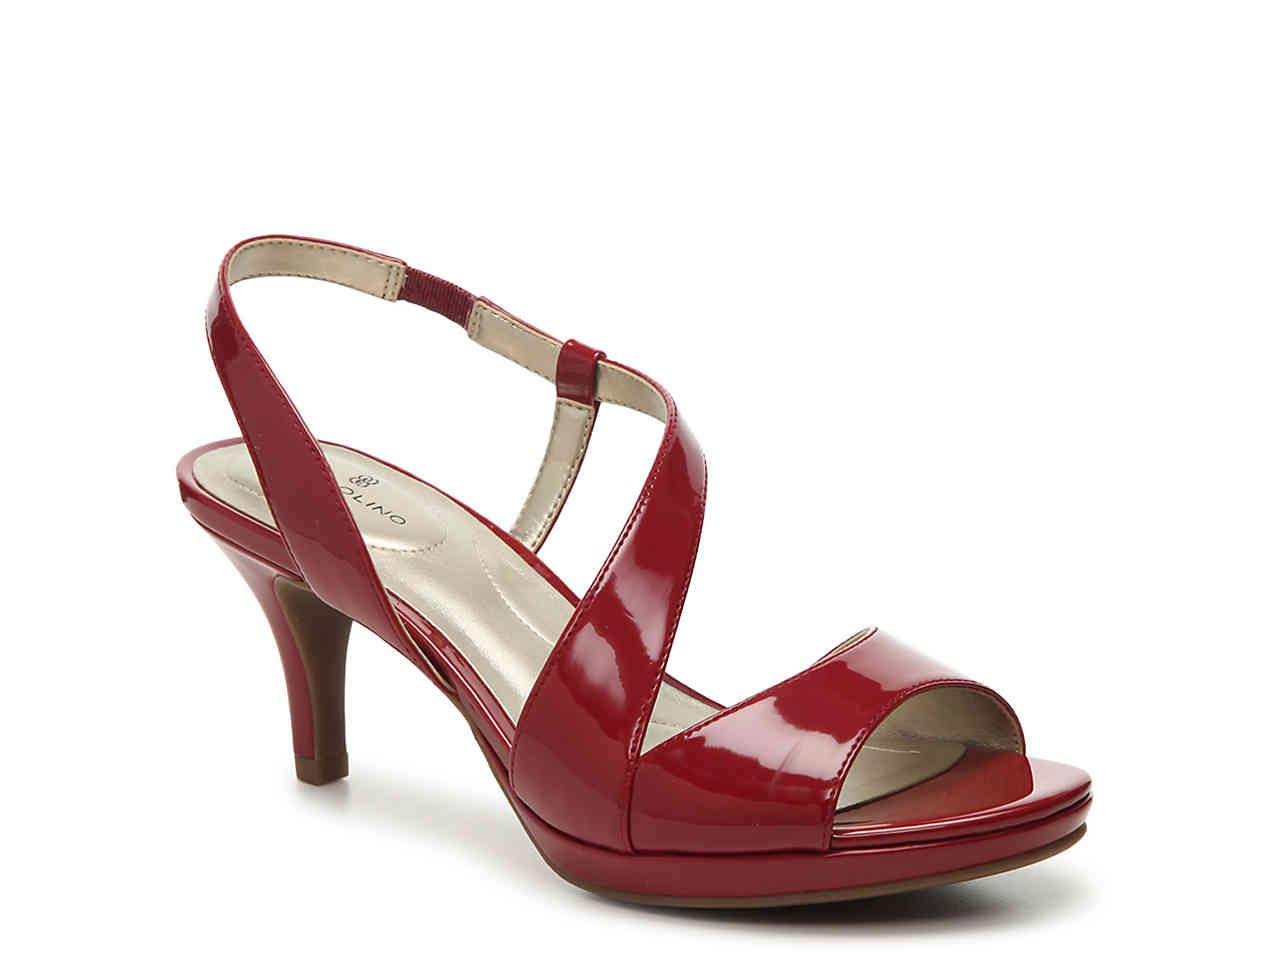 704c5fdface6 Lyst - Bandolino Karcsi Platform Sandal in Red